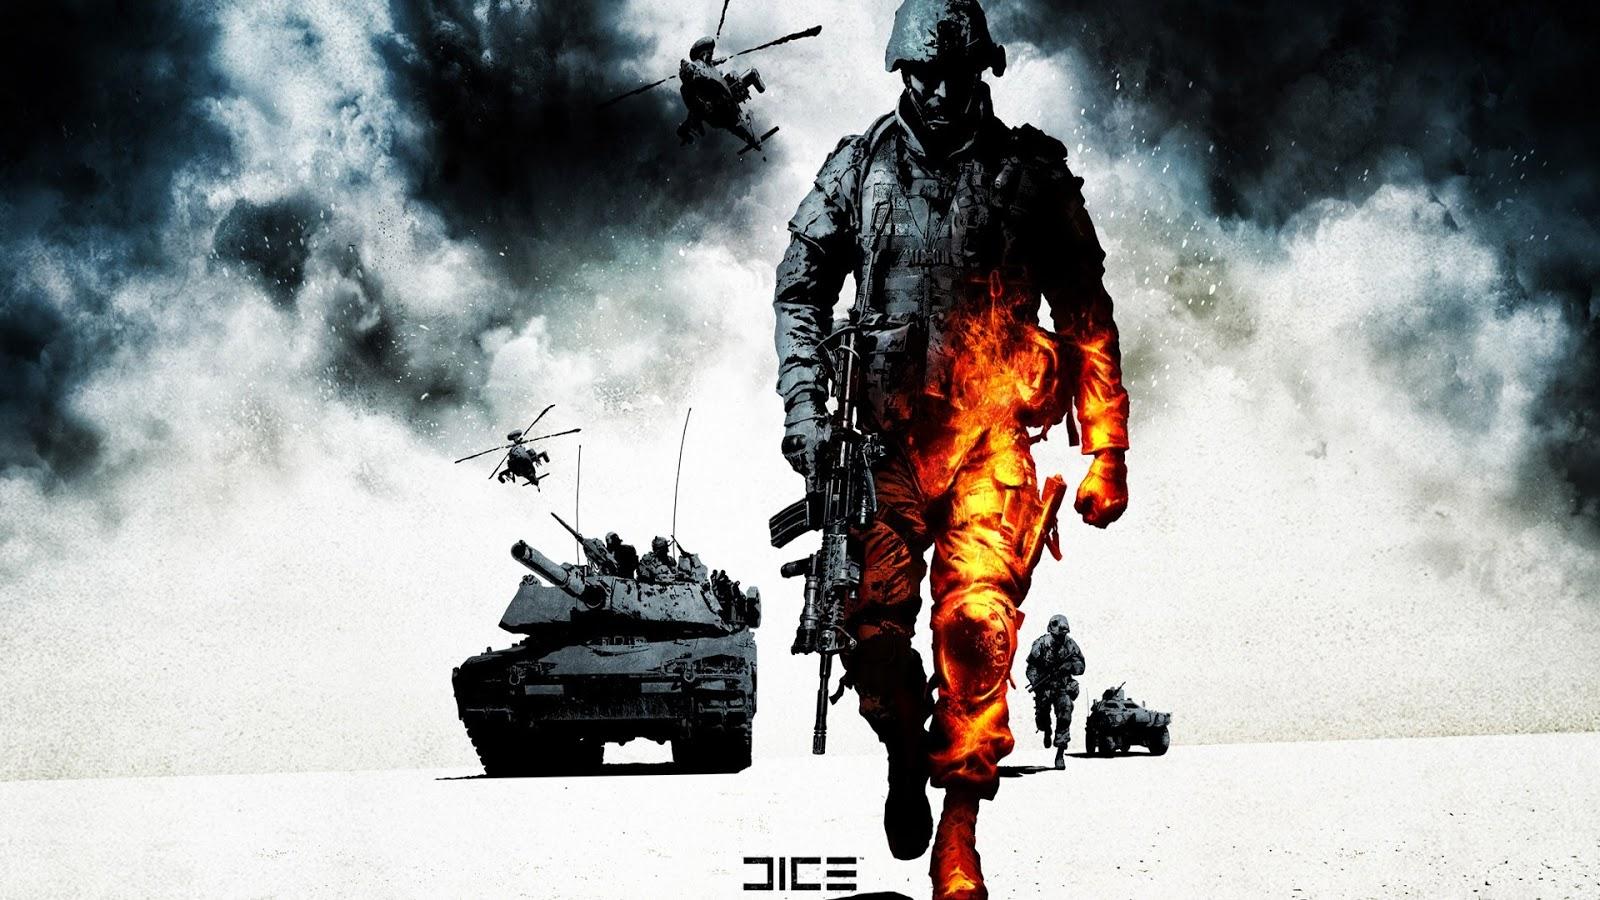 http://4.bp.blogspot.com/-To5dctu38UQ/UO_t-slh8qI/AAAAAAAABqA/nWZ0gf9qJ6c/s1600/battlefield-ii-game-wallpaper-1920x1080-208.jpg